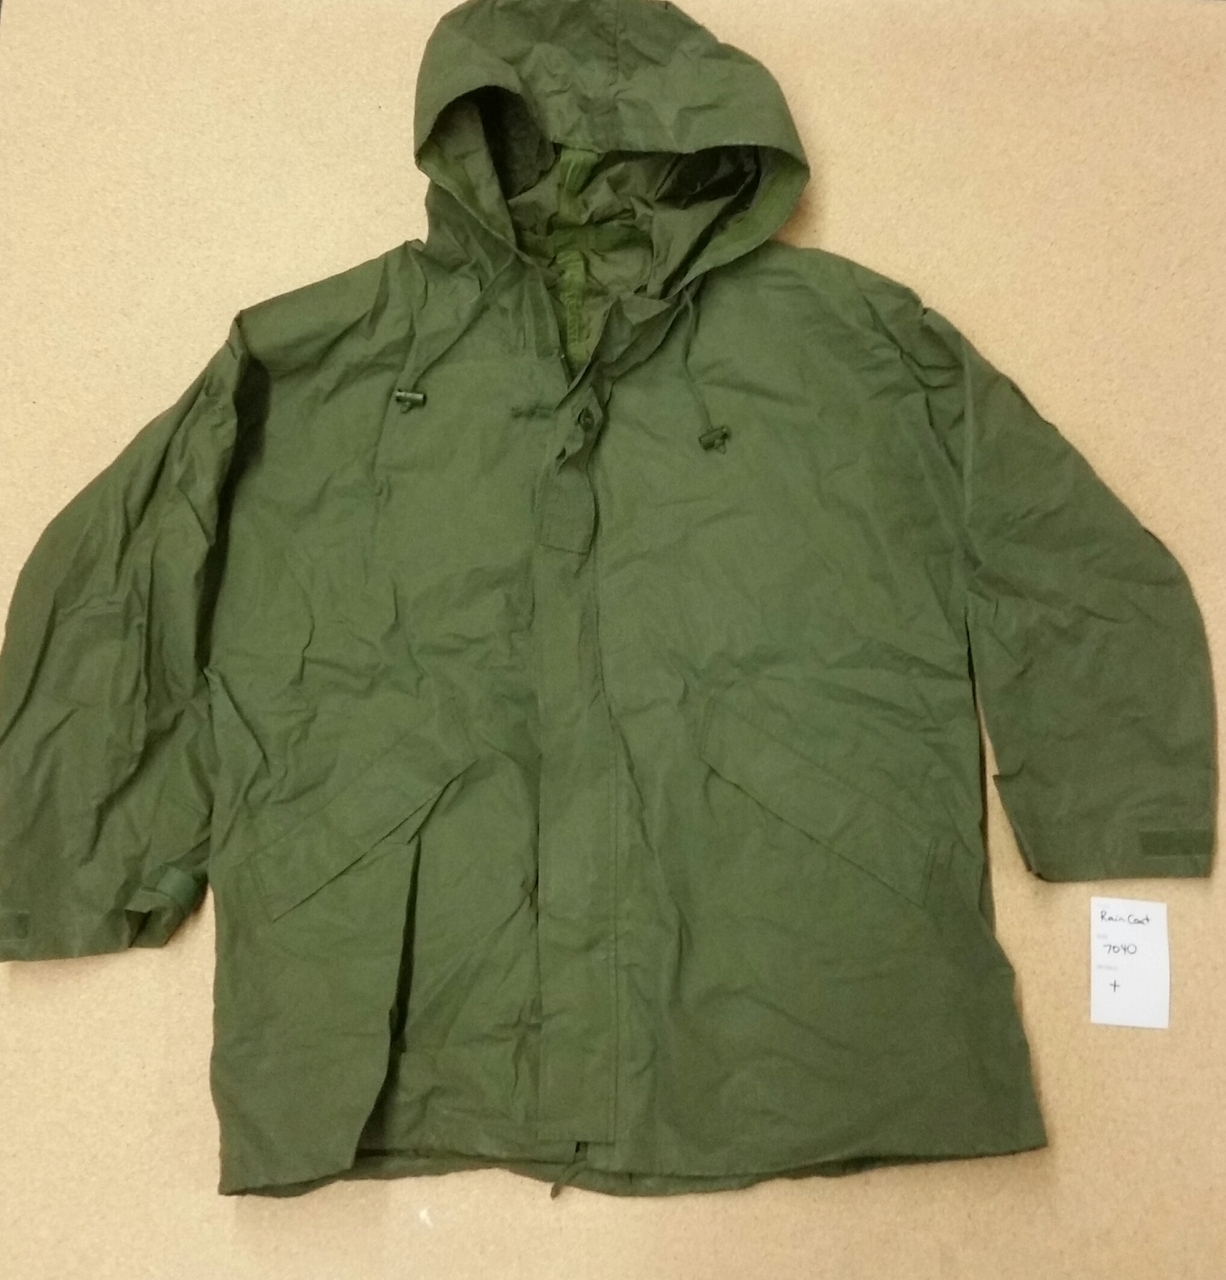 New Unissued Canadian Forces Rain Coat